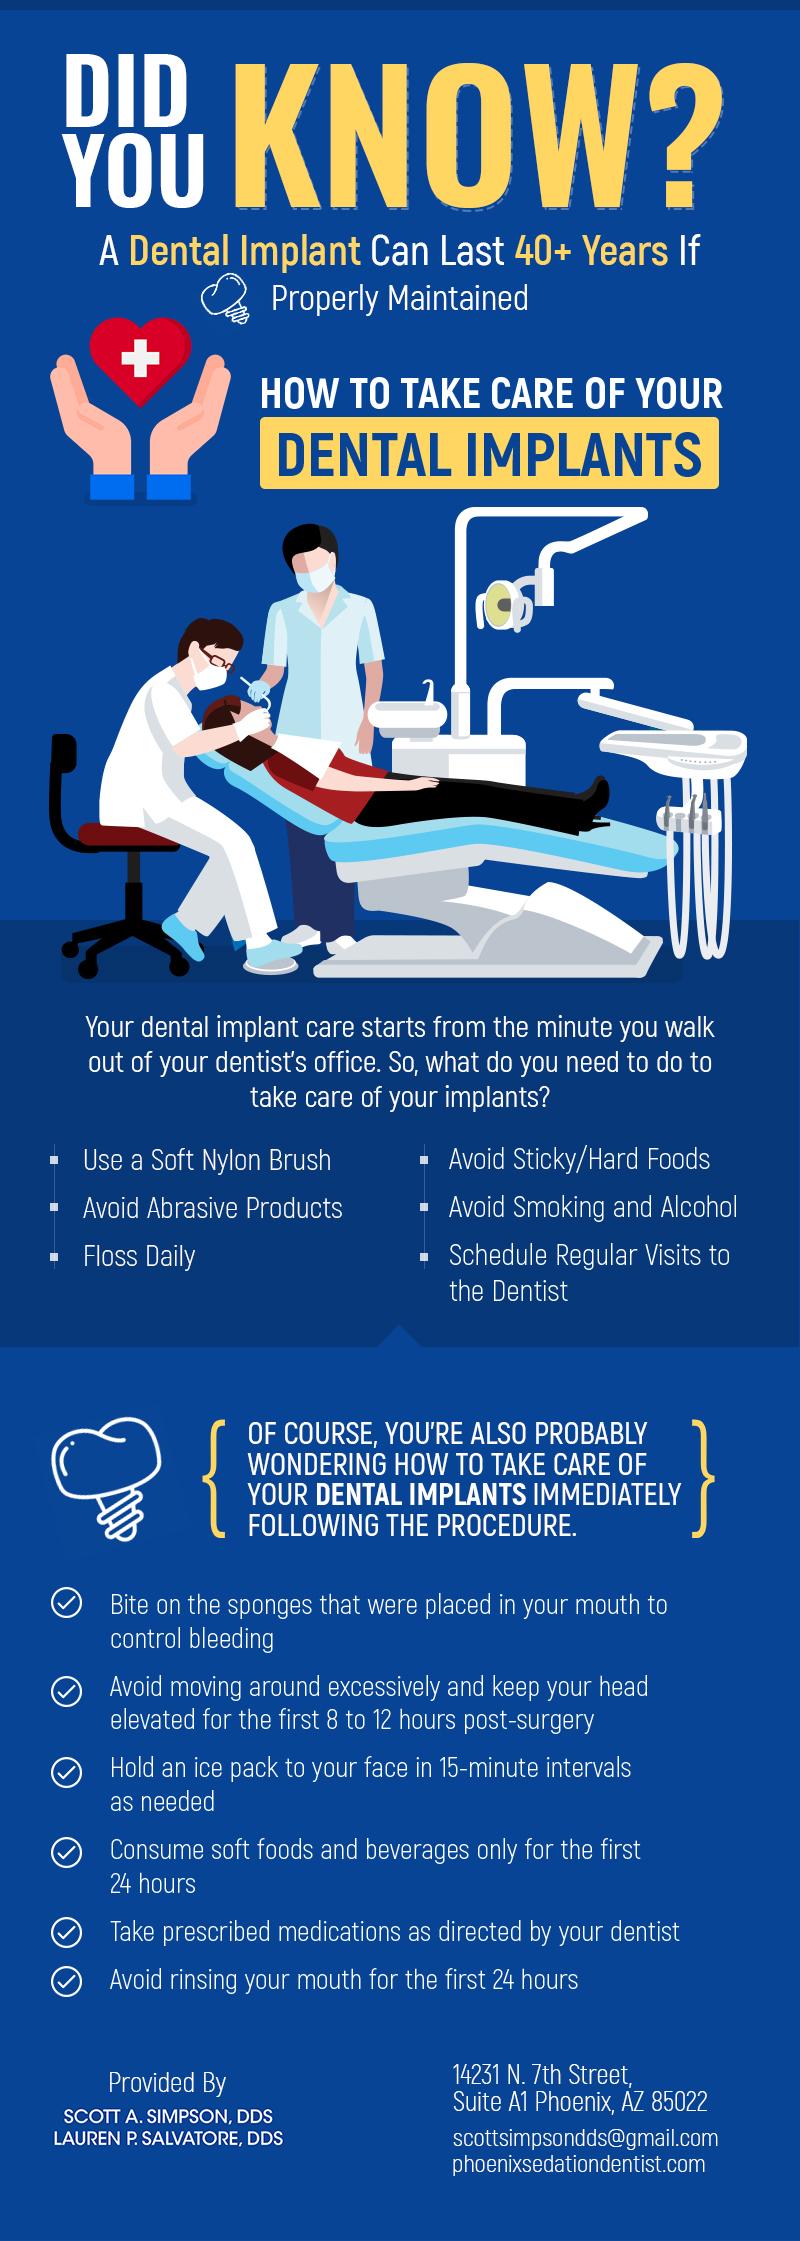 Scott A. Simpson, DDS – Implant Dentistry in Phoenix AZ 85022